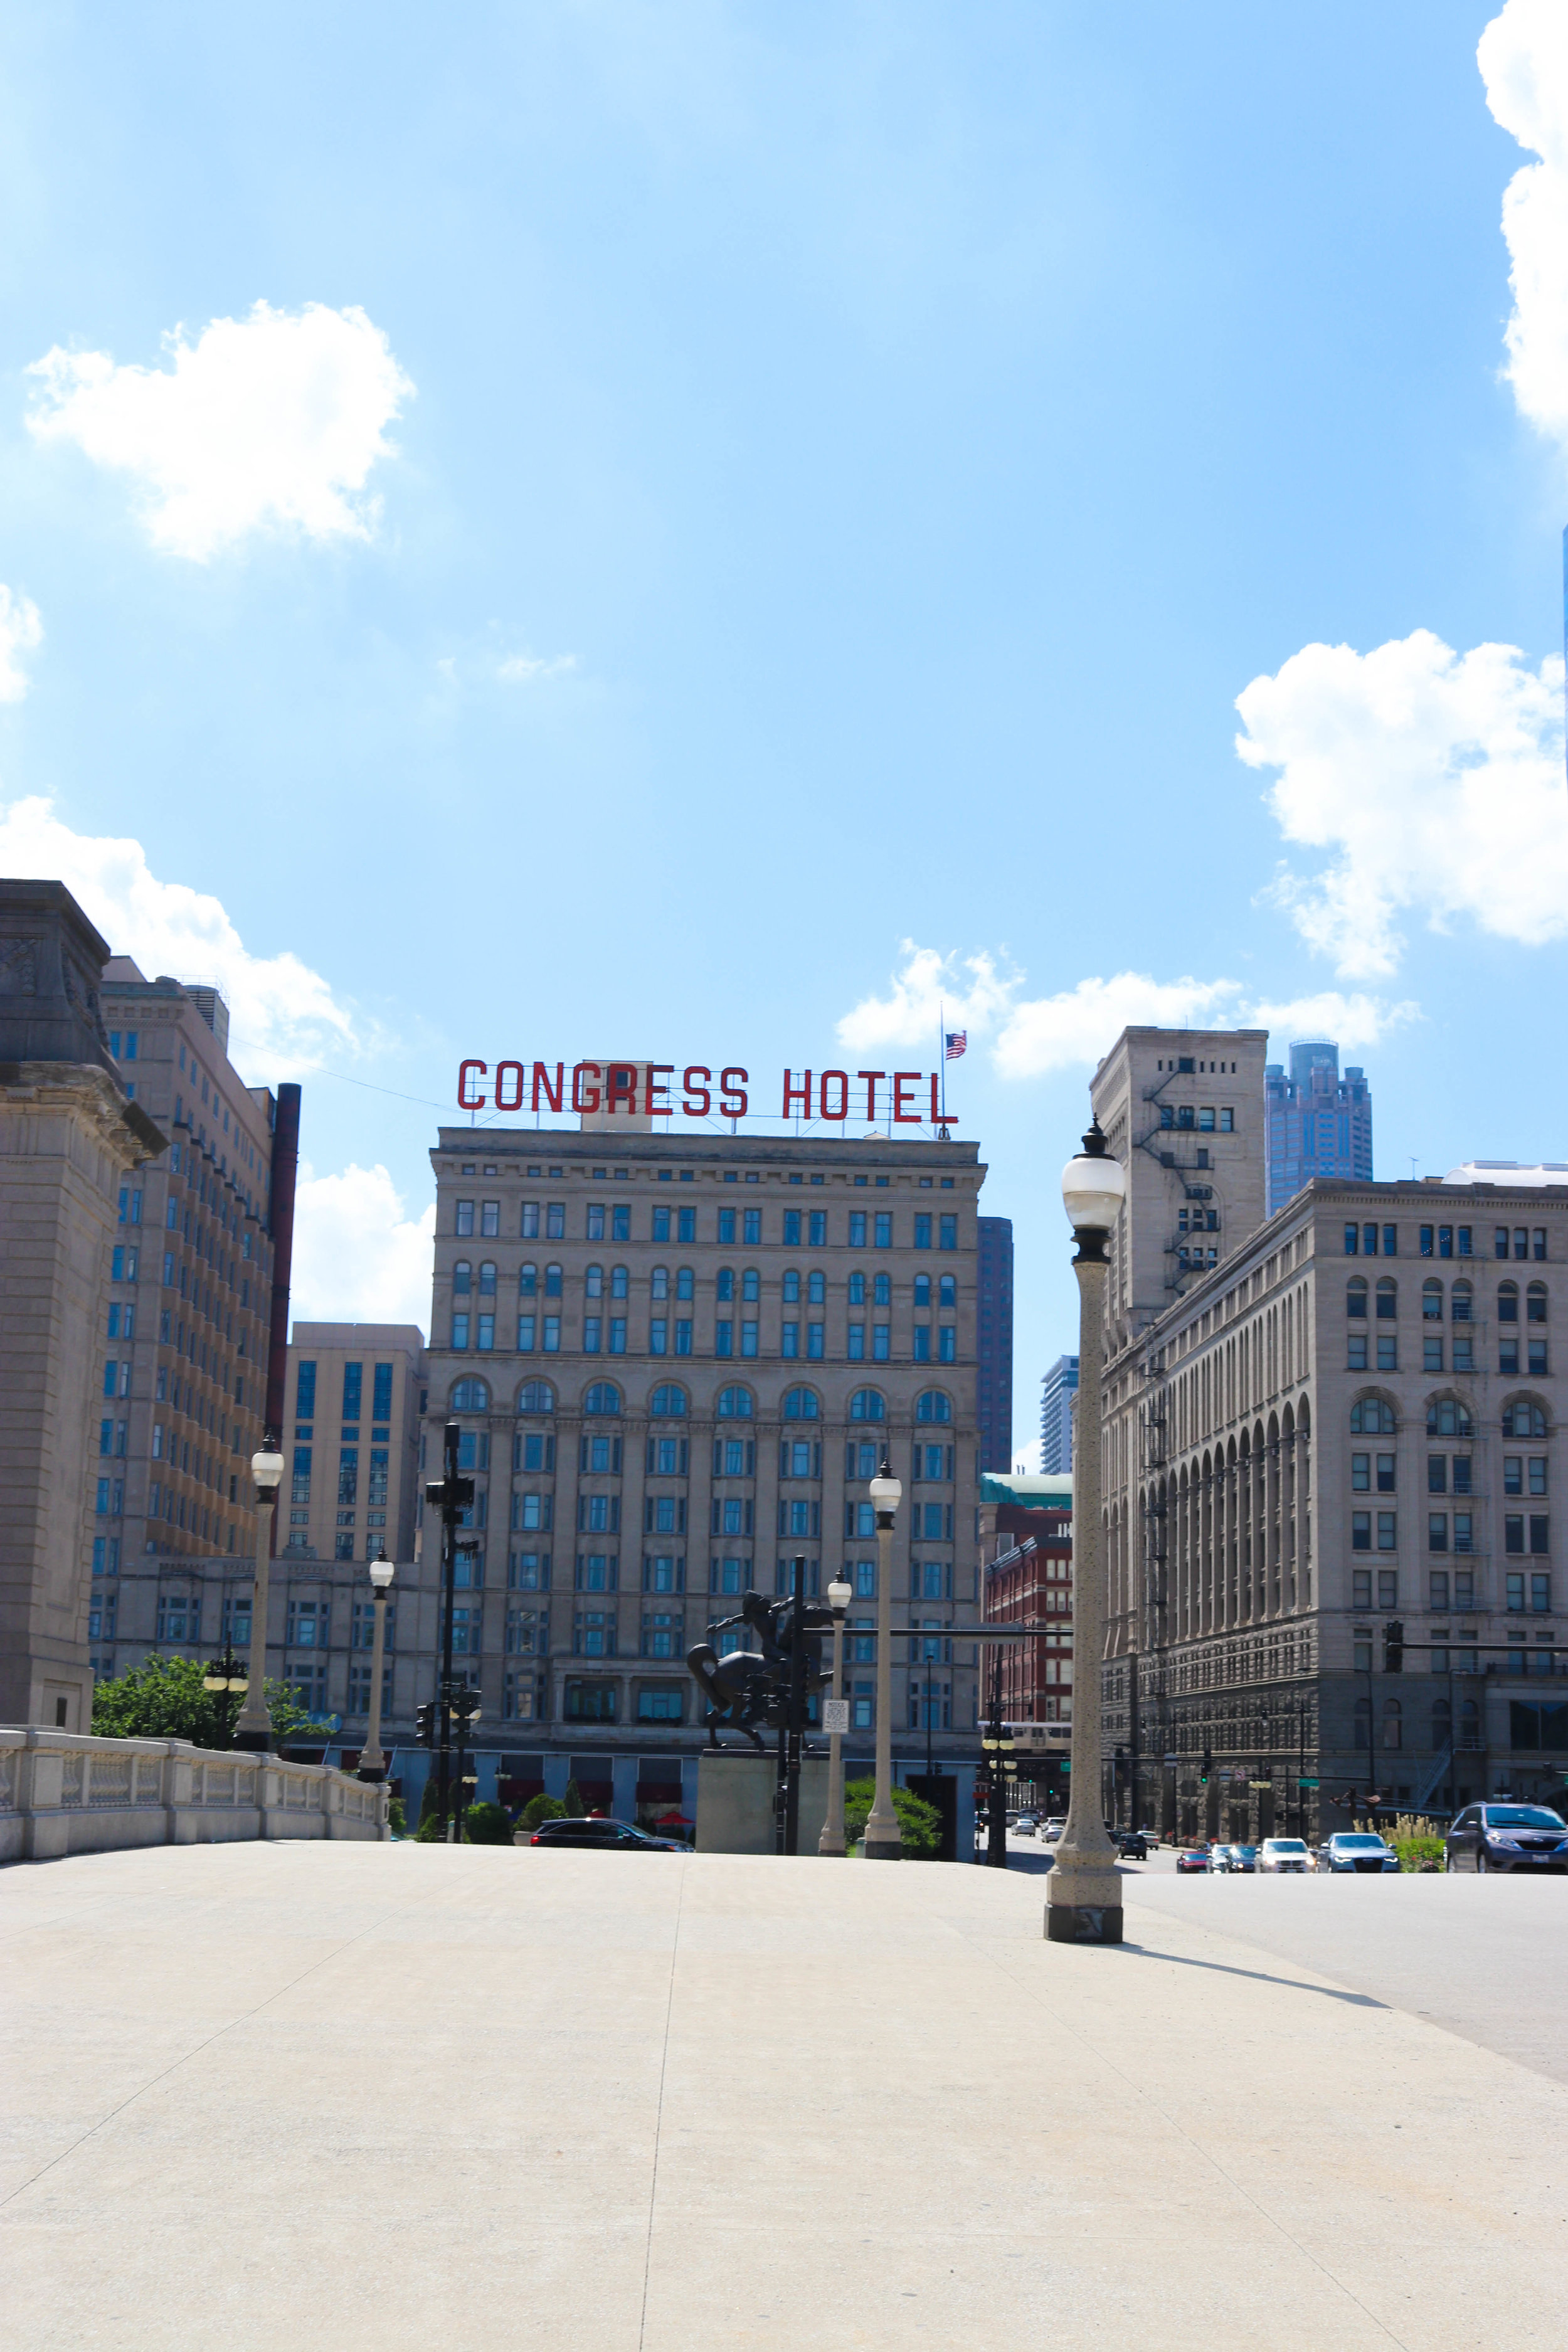 congress hotel.jpg